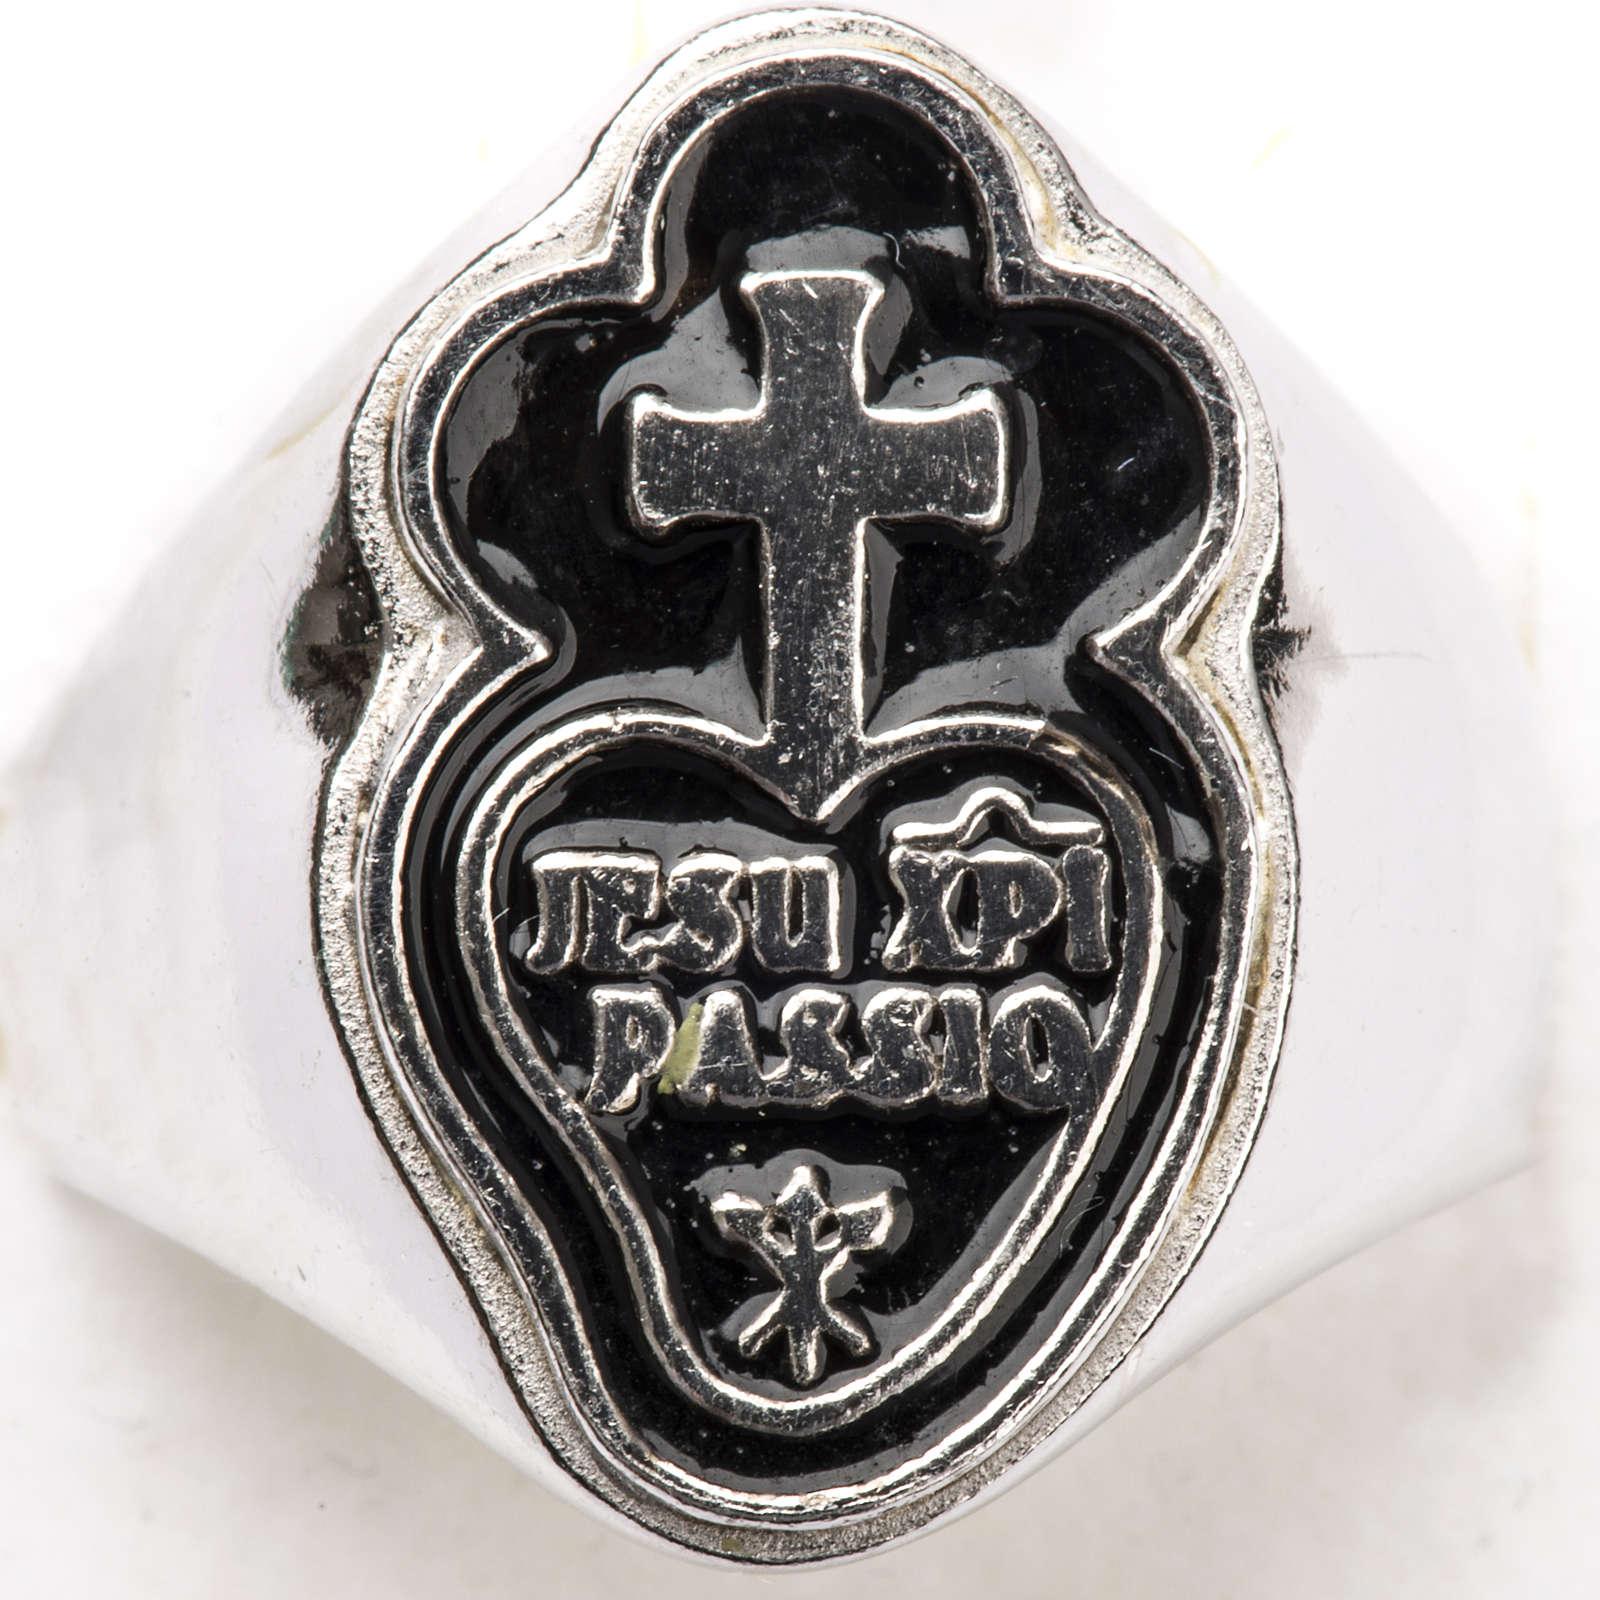 Bishop's Ring in silver 925, Jesu Xpi Passio, adjustable 3